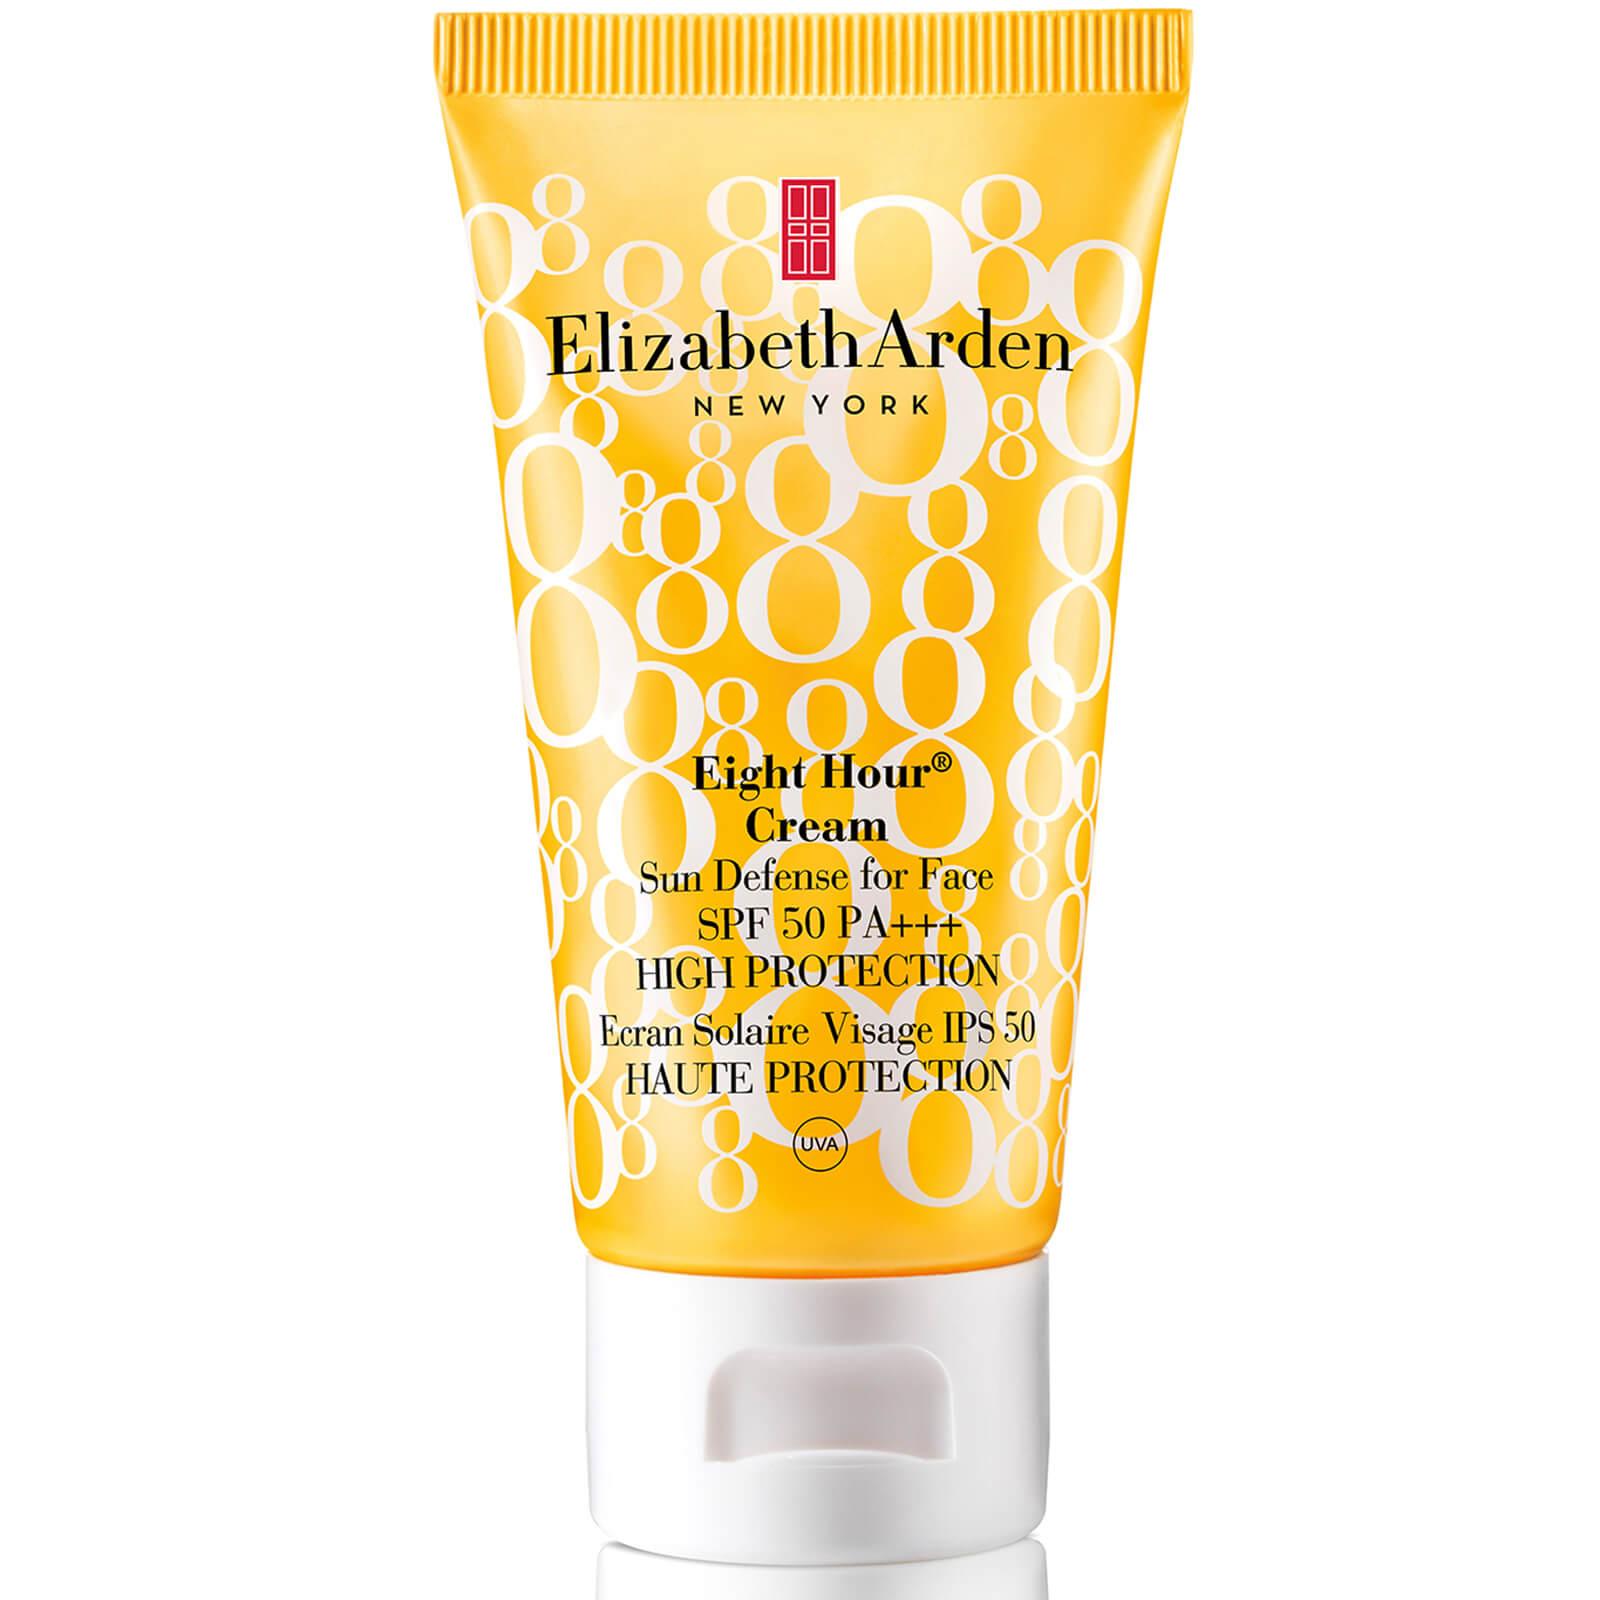 8f9a677b4 Elizabeth Arden Eight Hour Cream Sun Defense For Face Spf 50 (50ml) | Free  Shipping | Lookfantastic